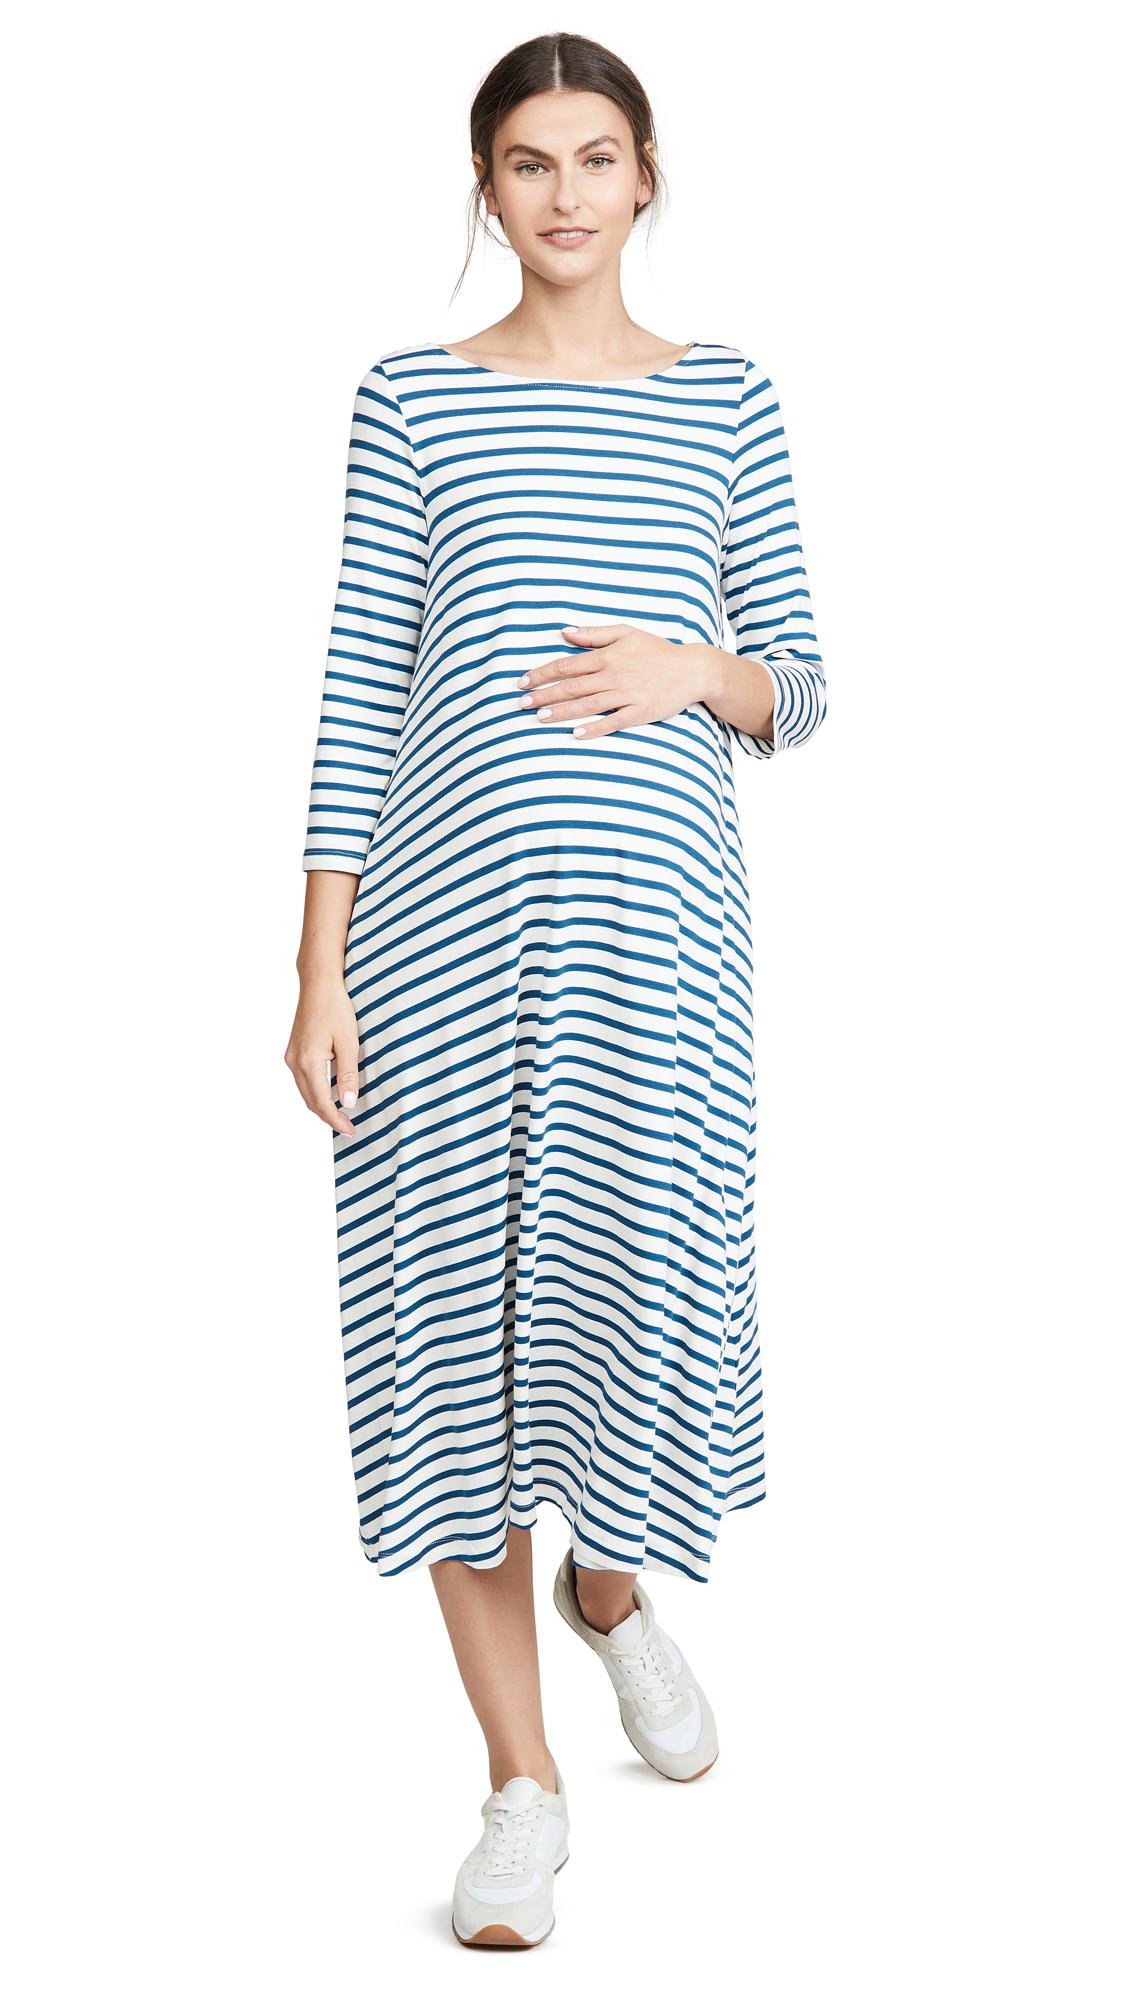 HATCH The Marina Dress - 30% Off Sale